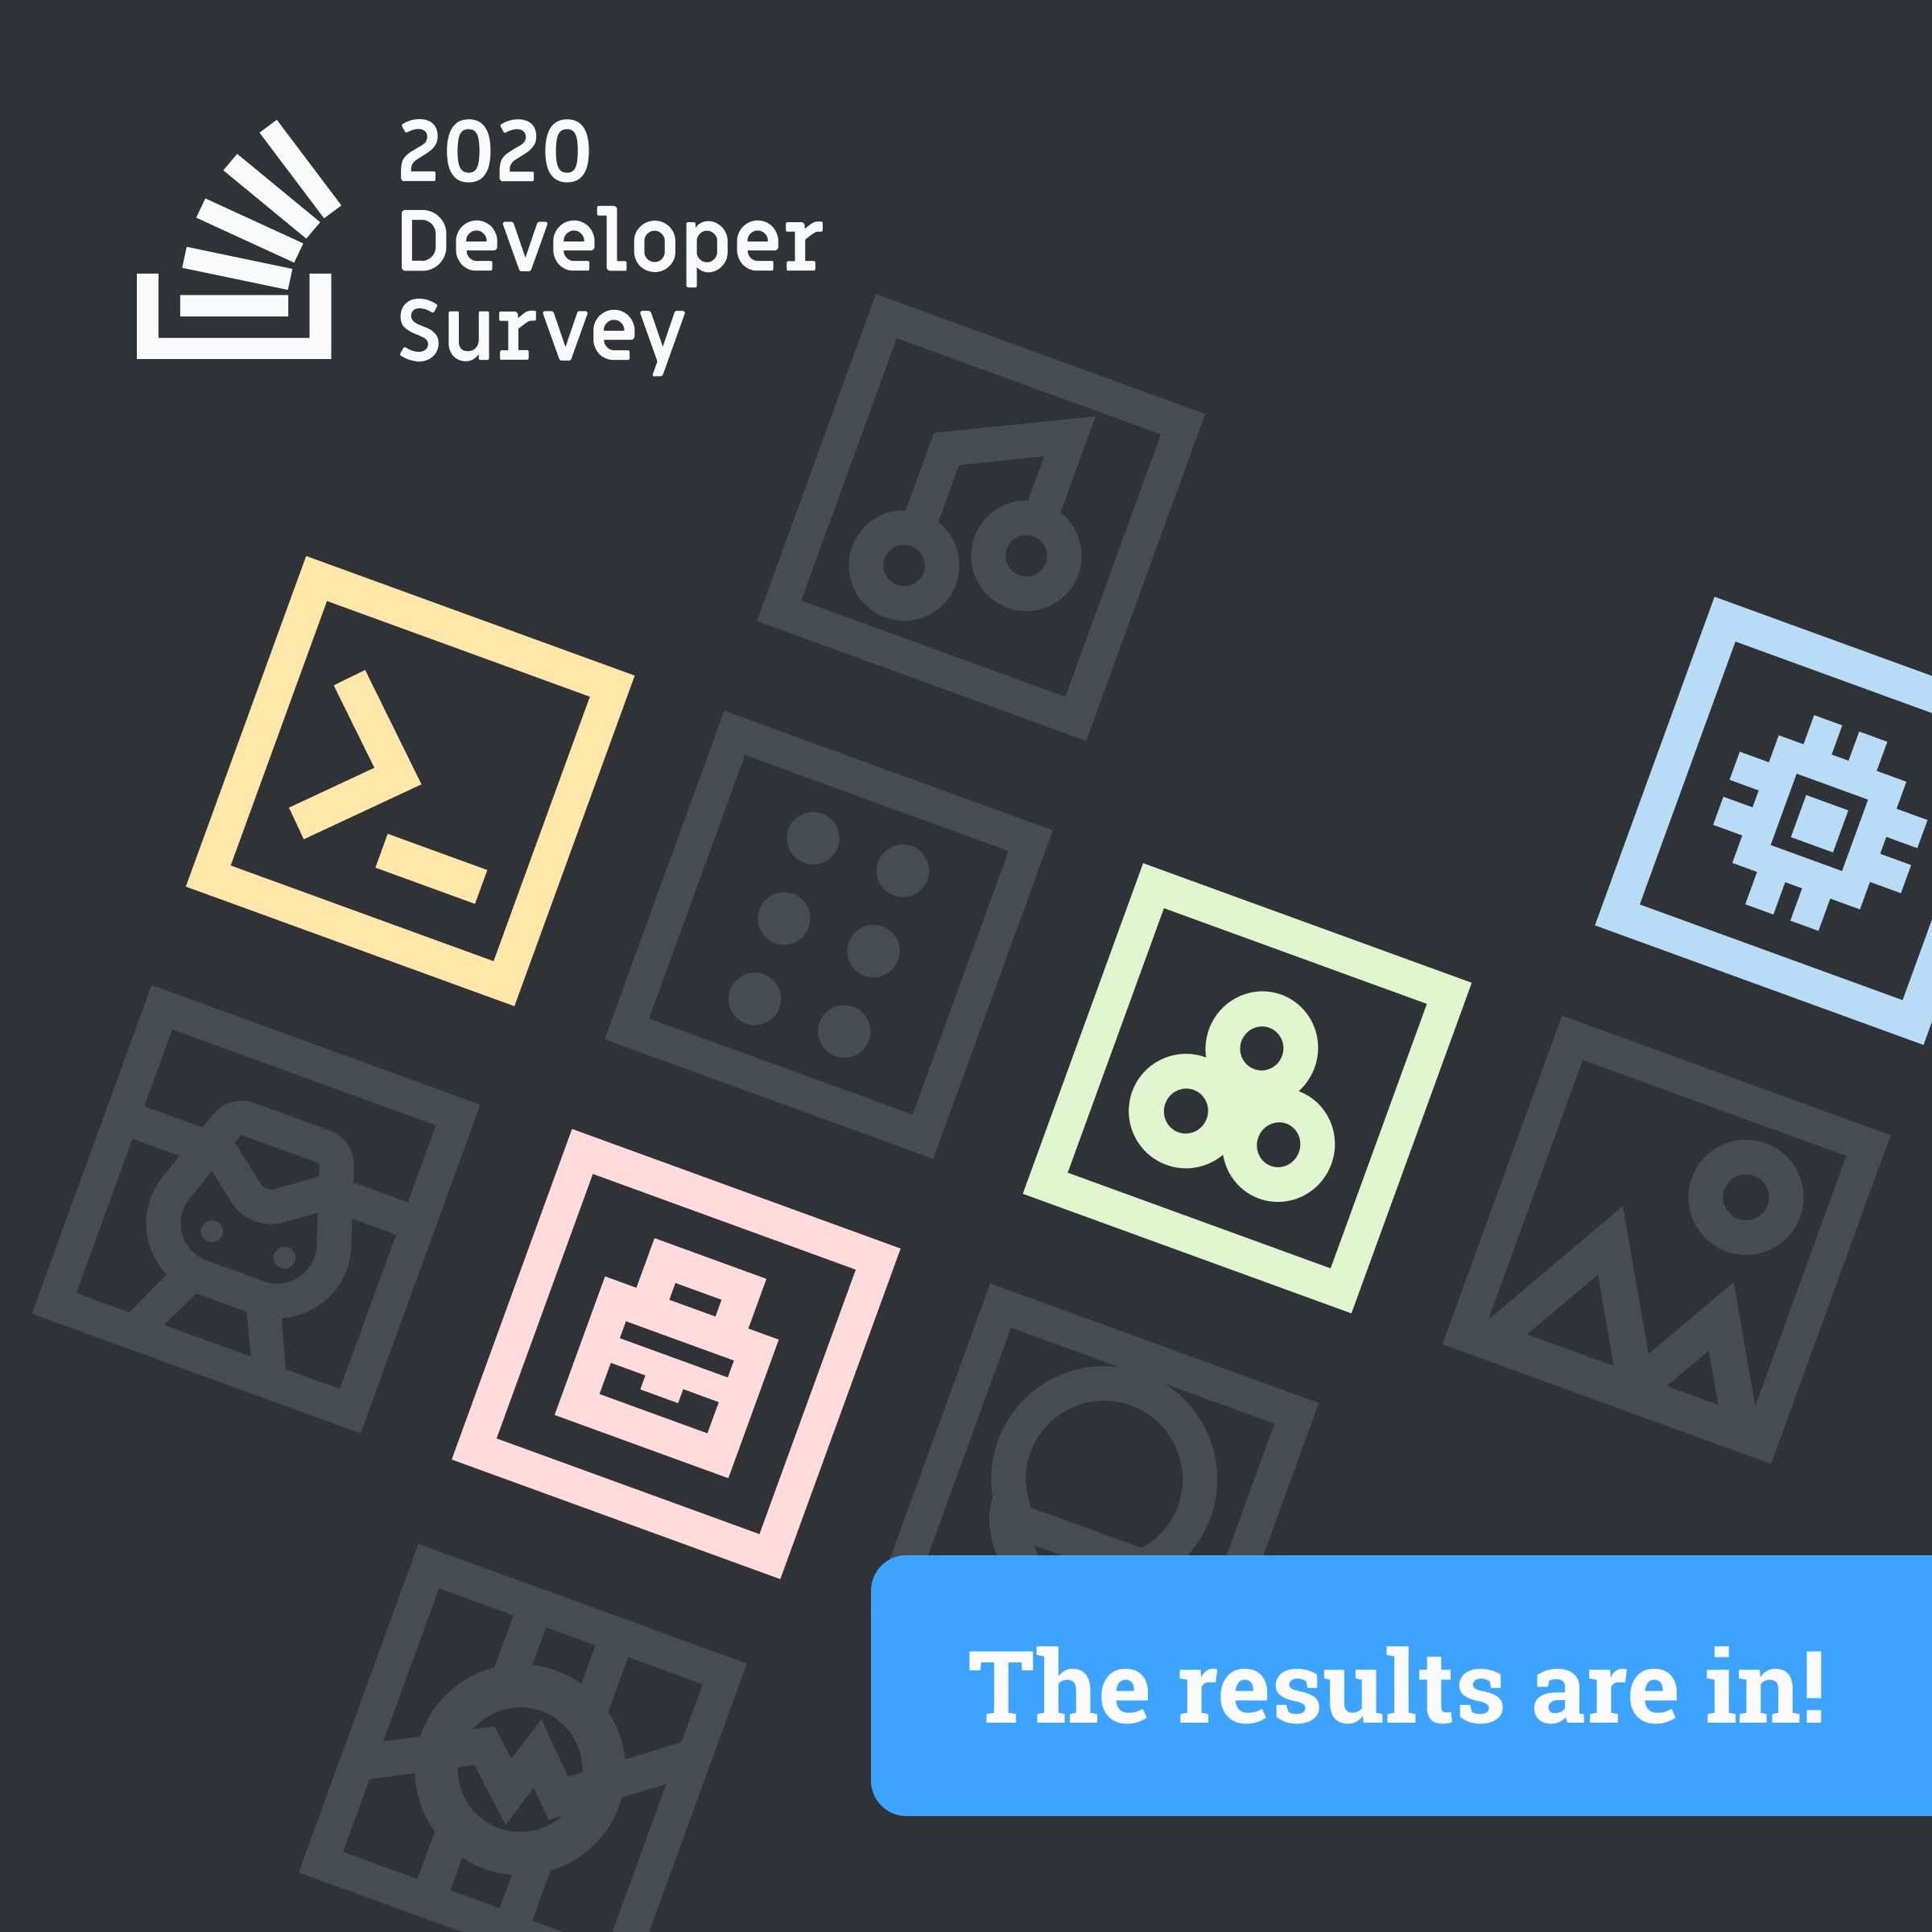 The 2020 Developer Survey results